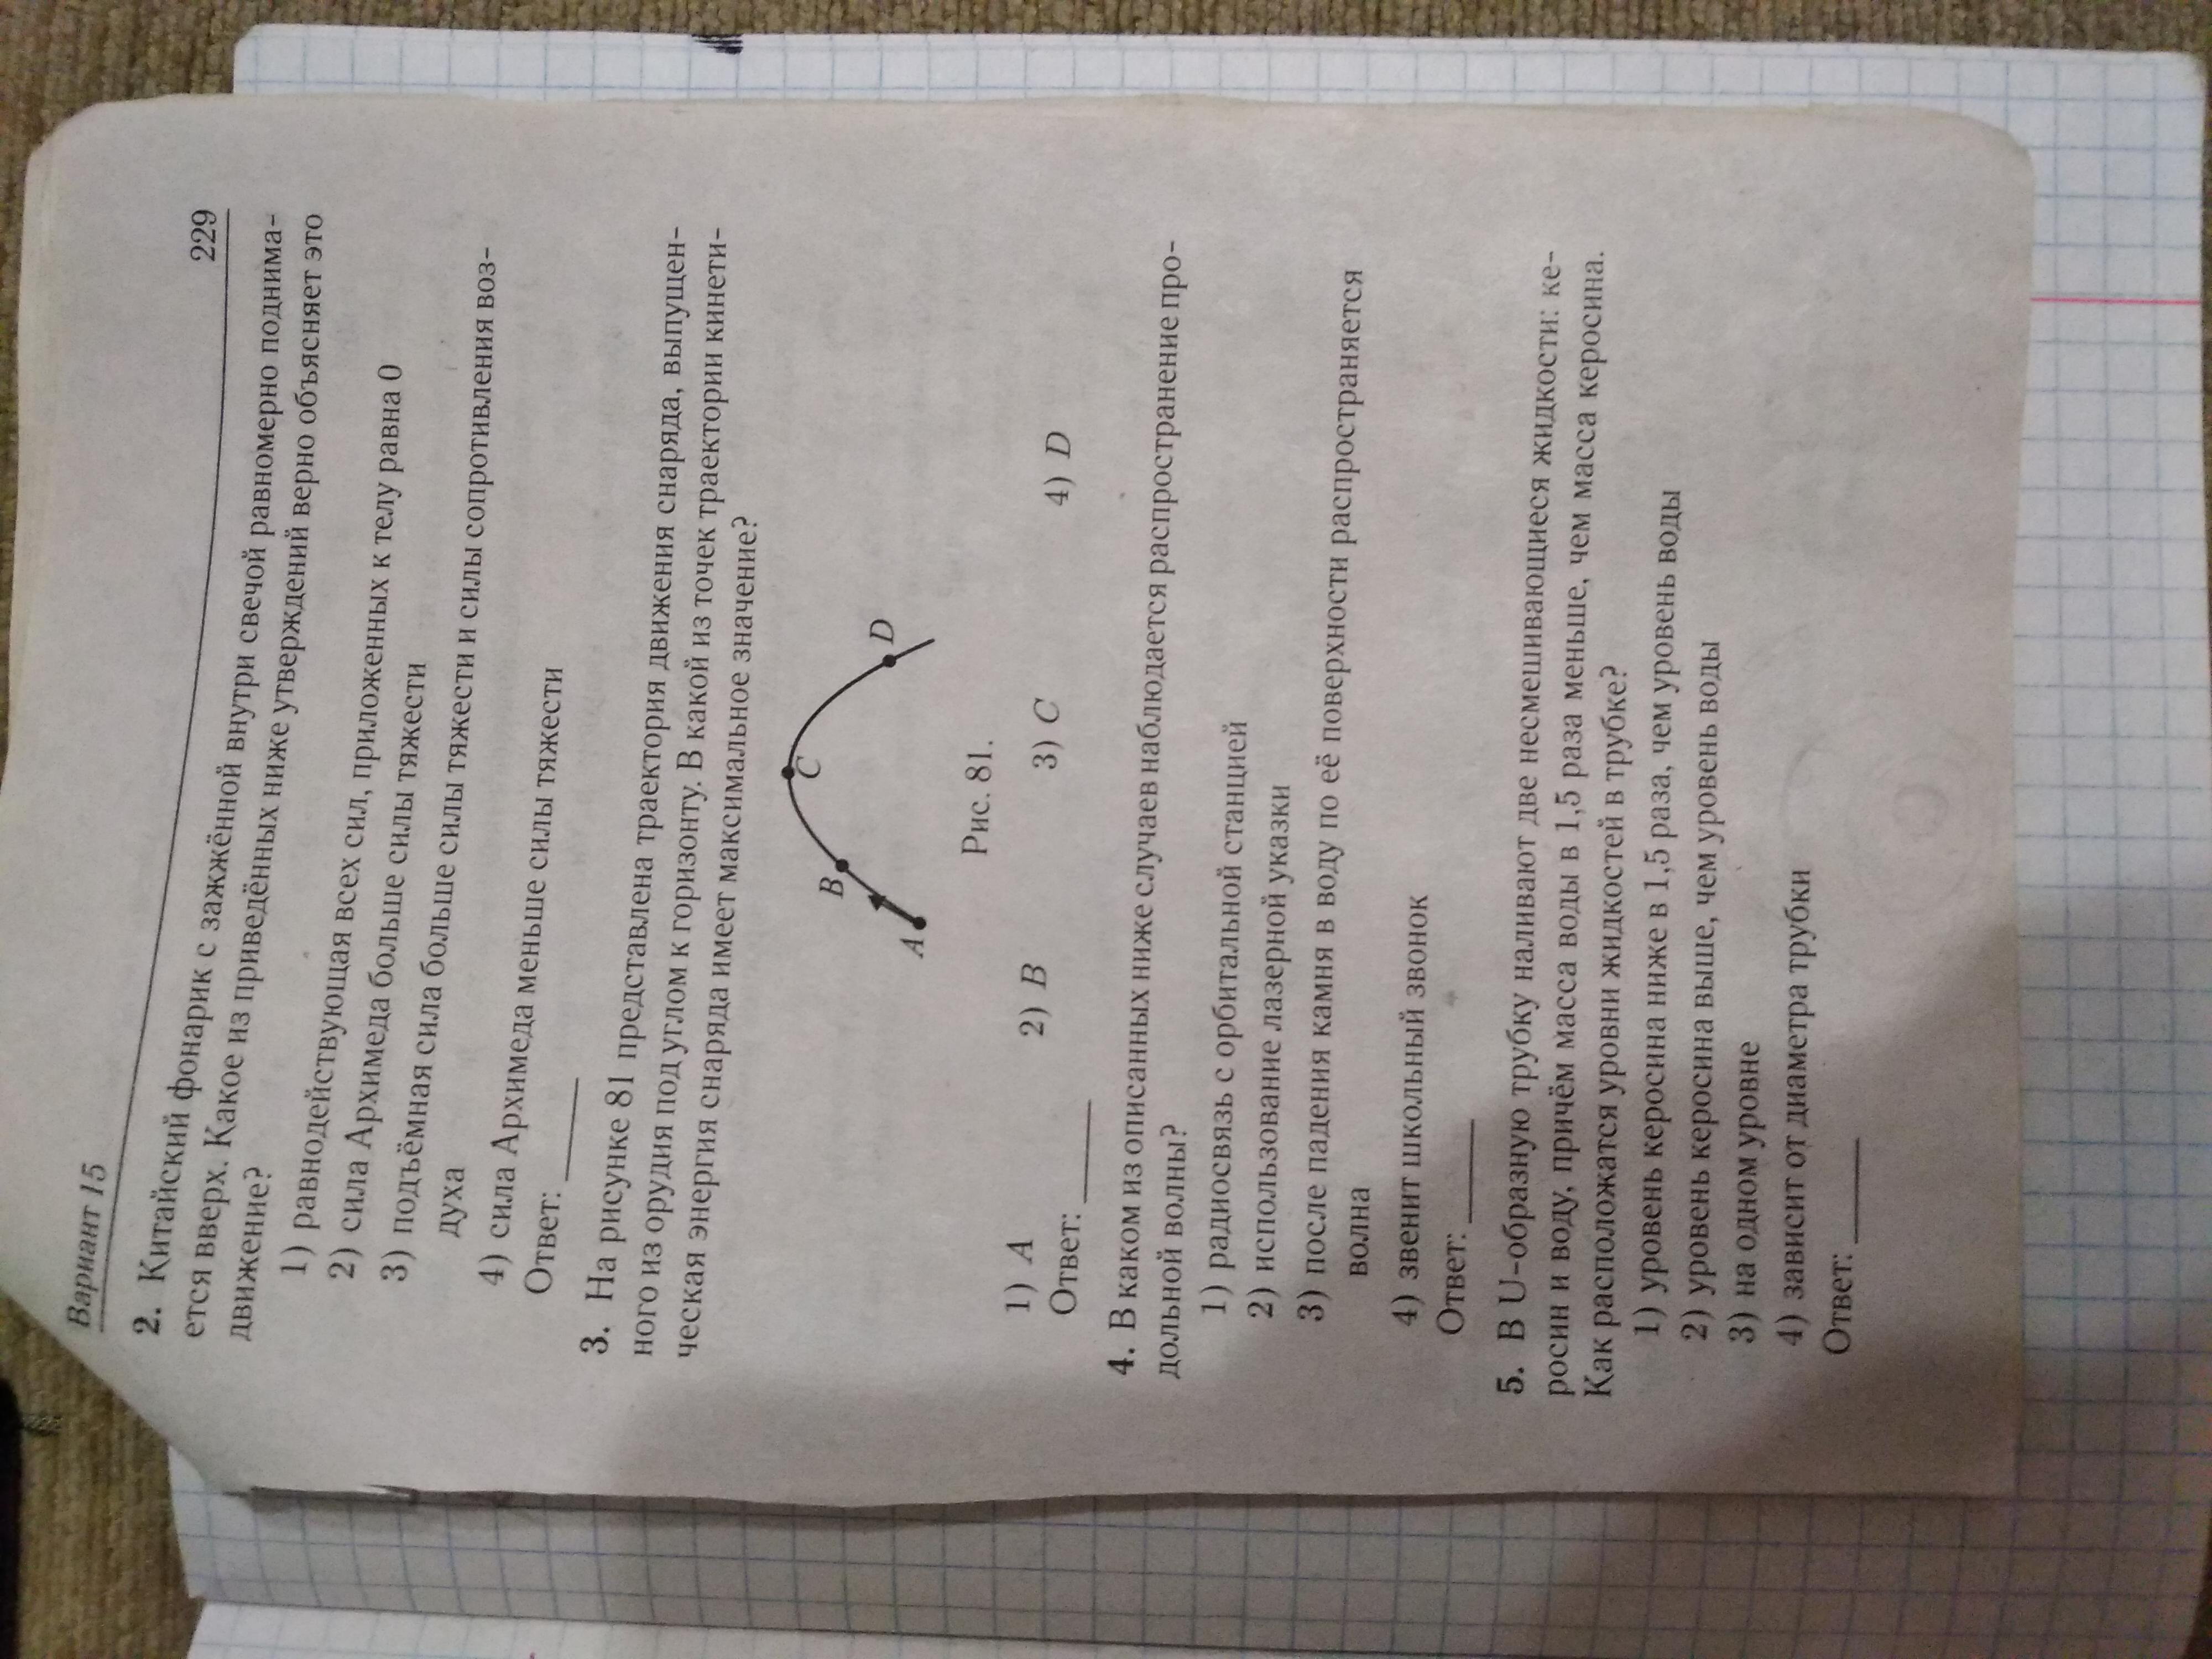 Помогите с тестом пожалуйста физика 9 класс. Даю